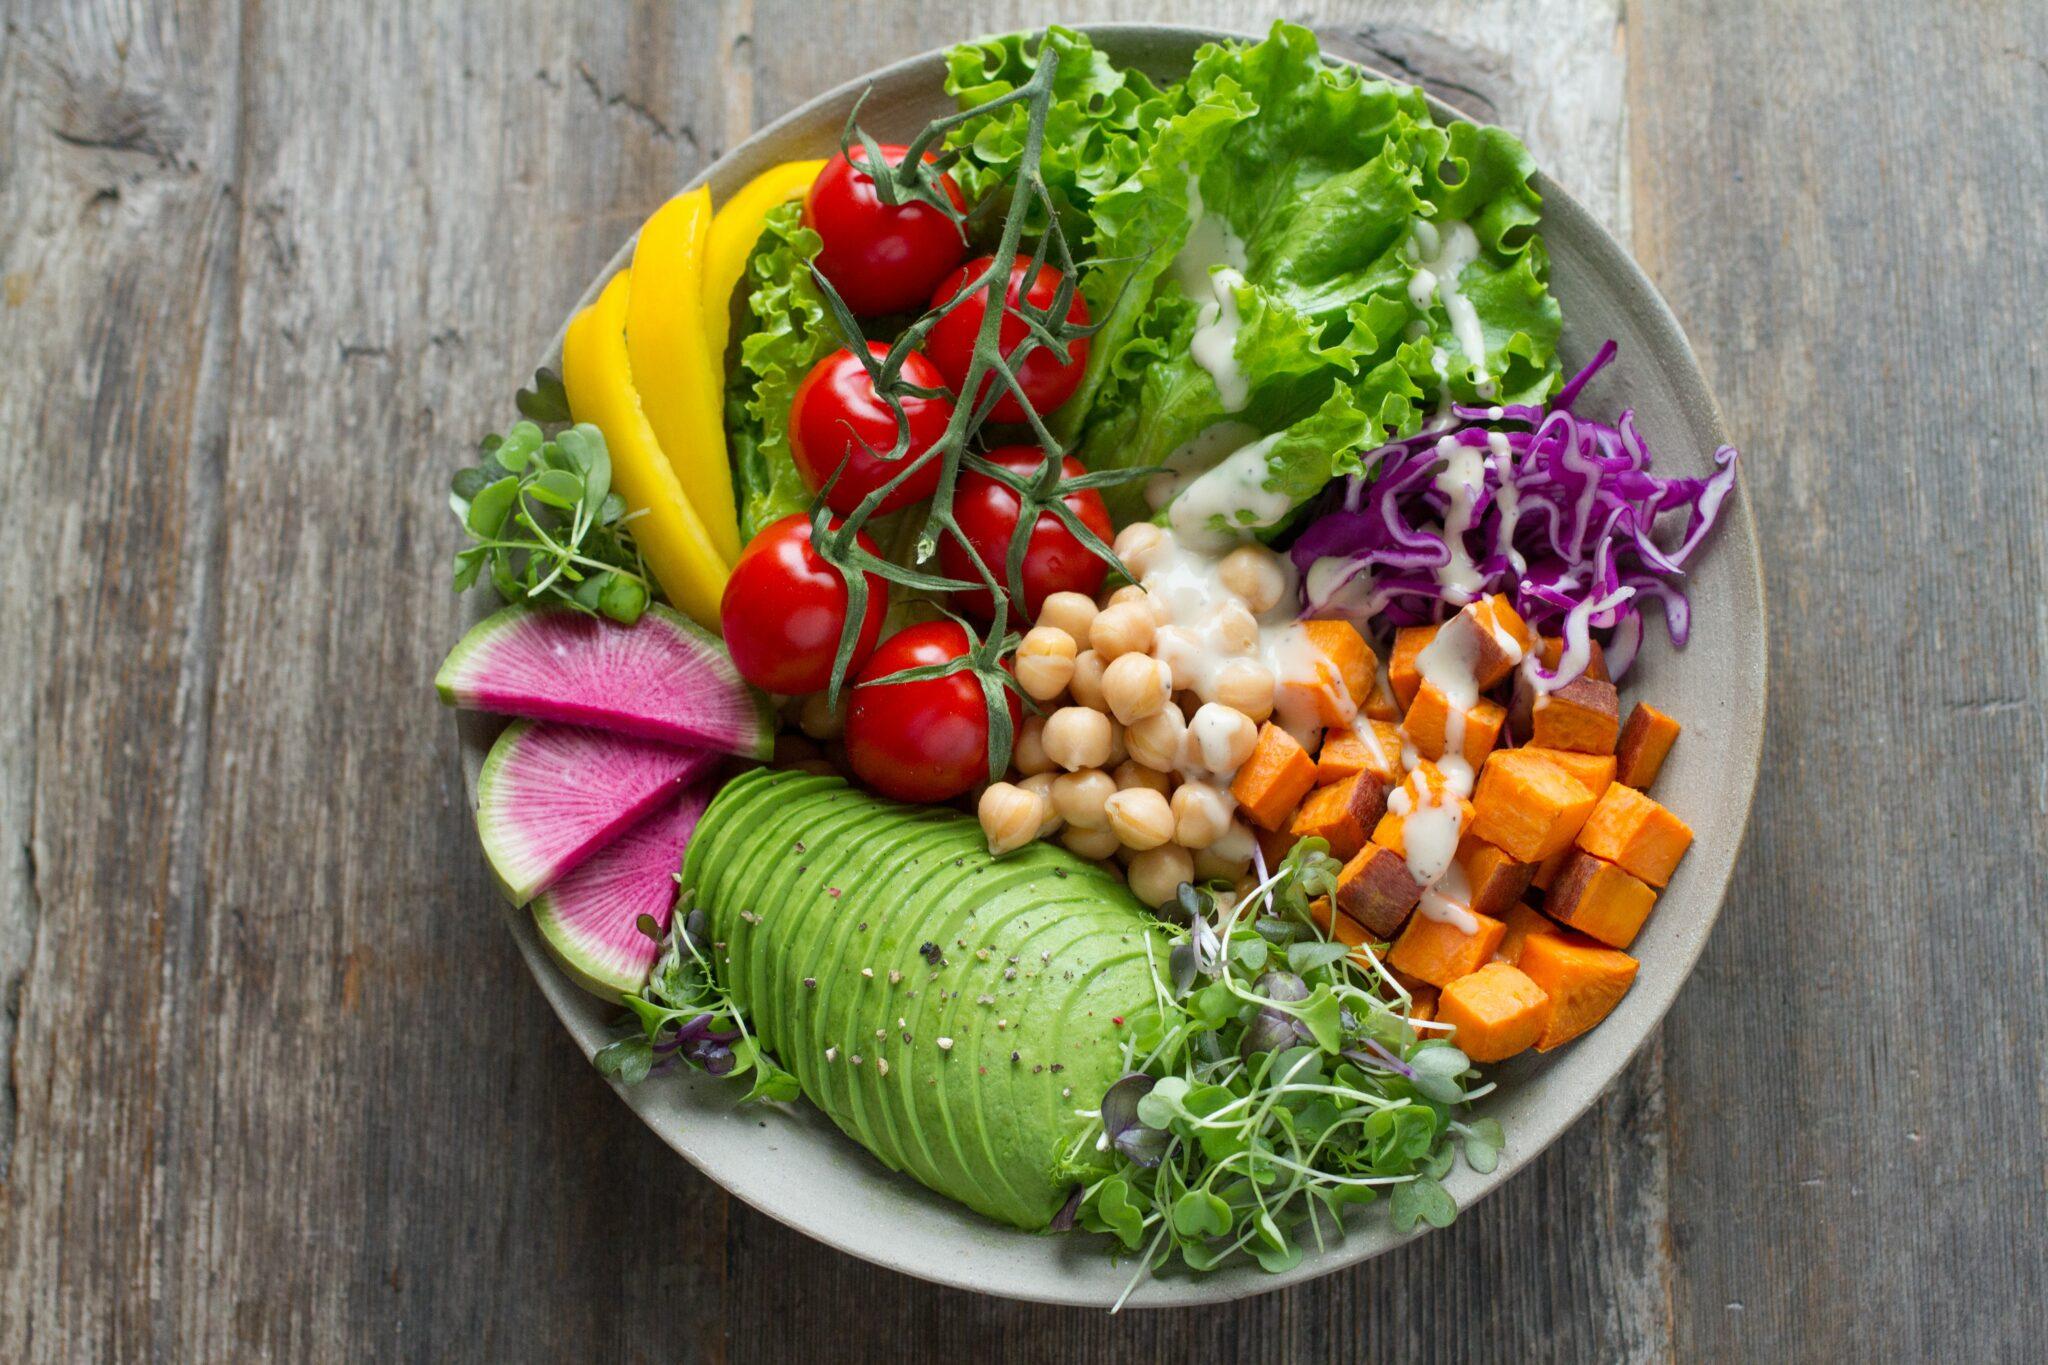 veganistisch eten - world vegan day - doetinchem